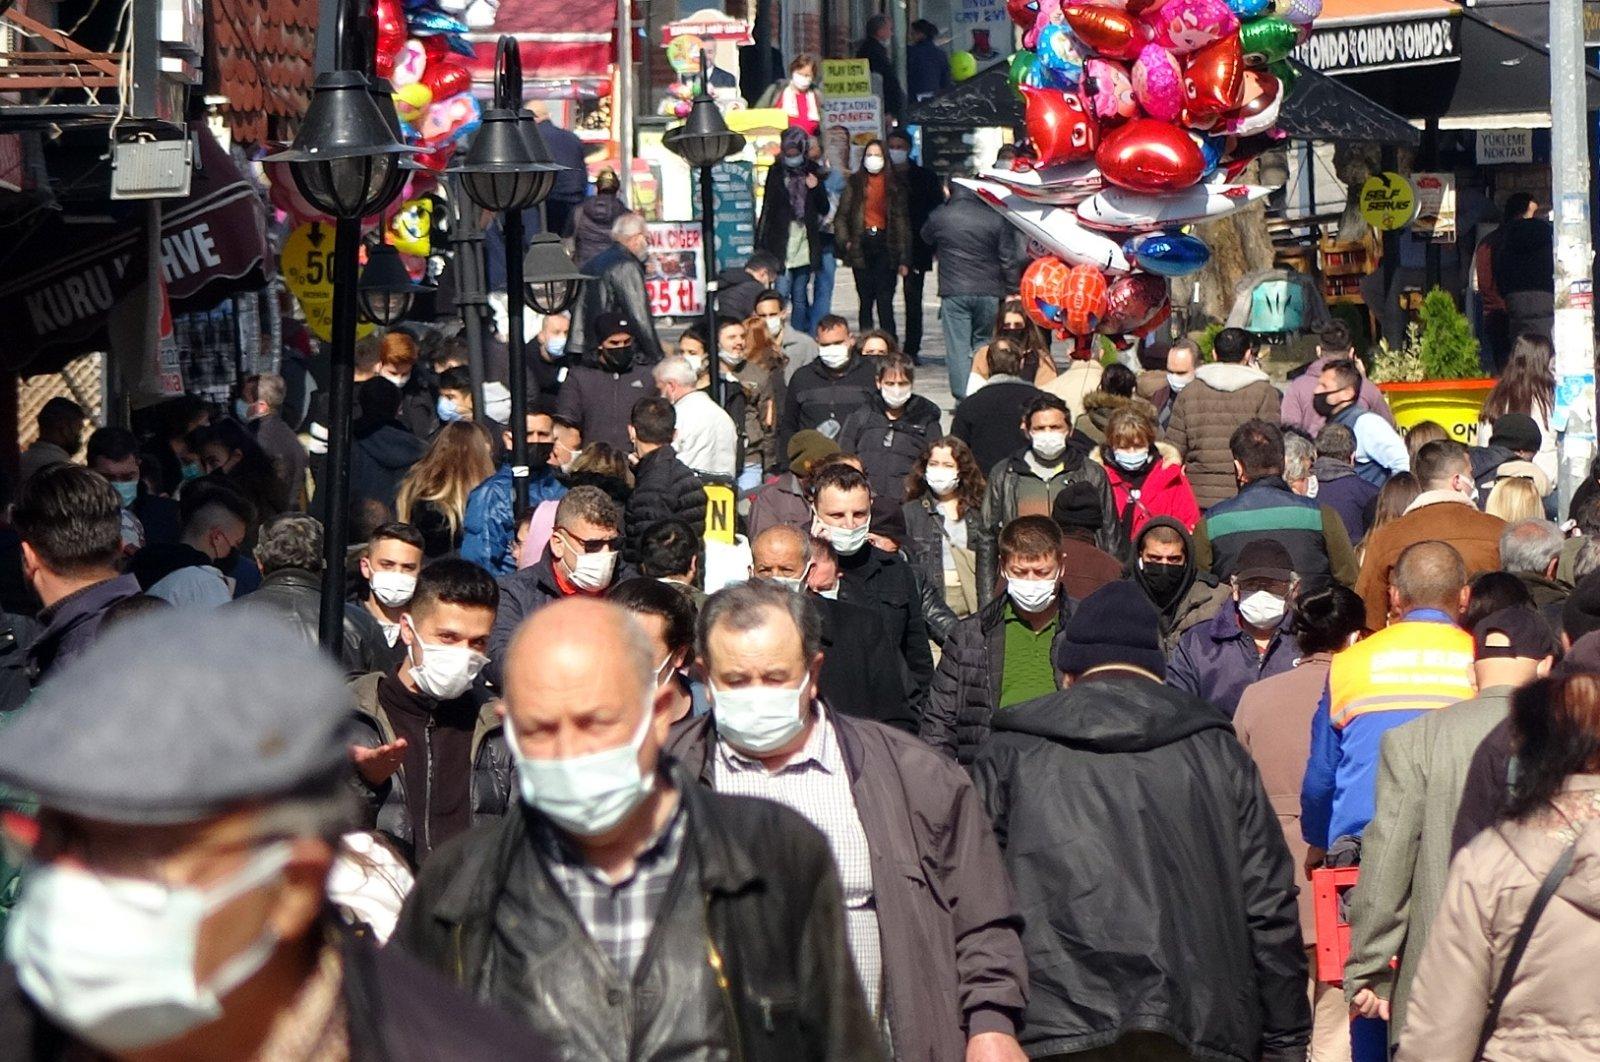 A crowd wearing protective masks walks on a street in Edirne, northwestern Turkey, March 9, 2021. (DHA PHOTO)